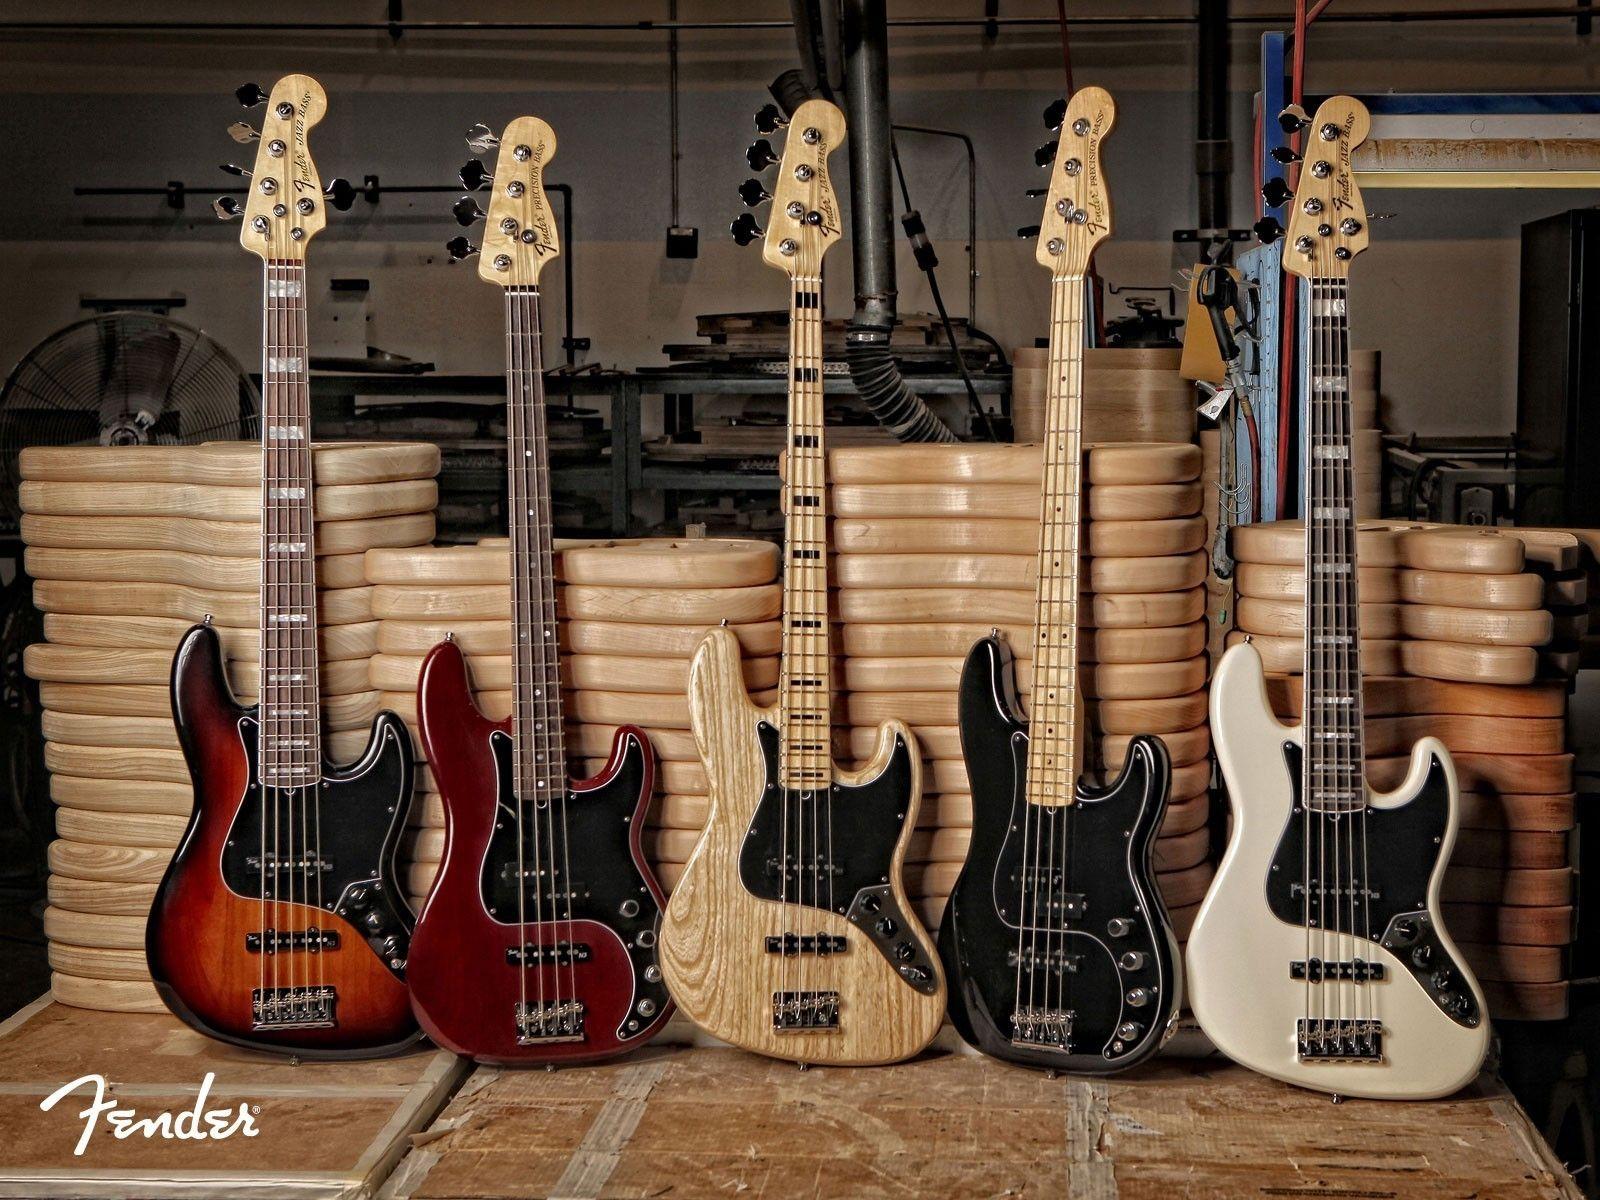 Fender Guitars Bass Images Wallpapers Music For Desktop Hd